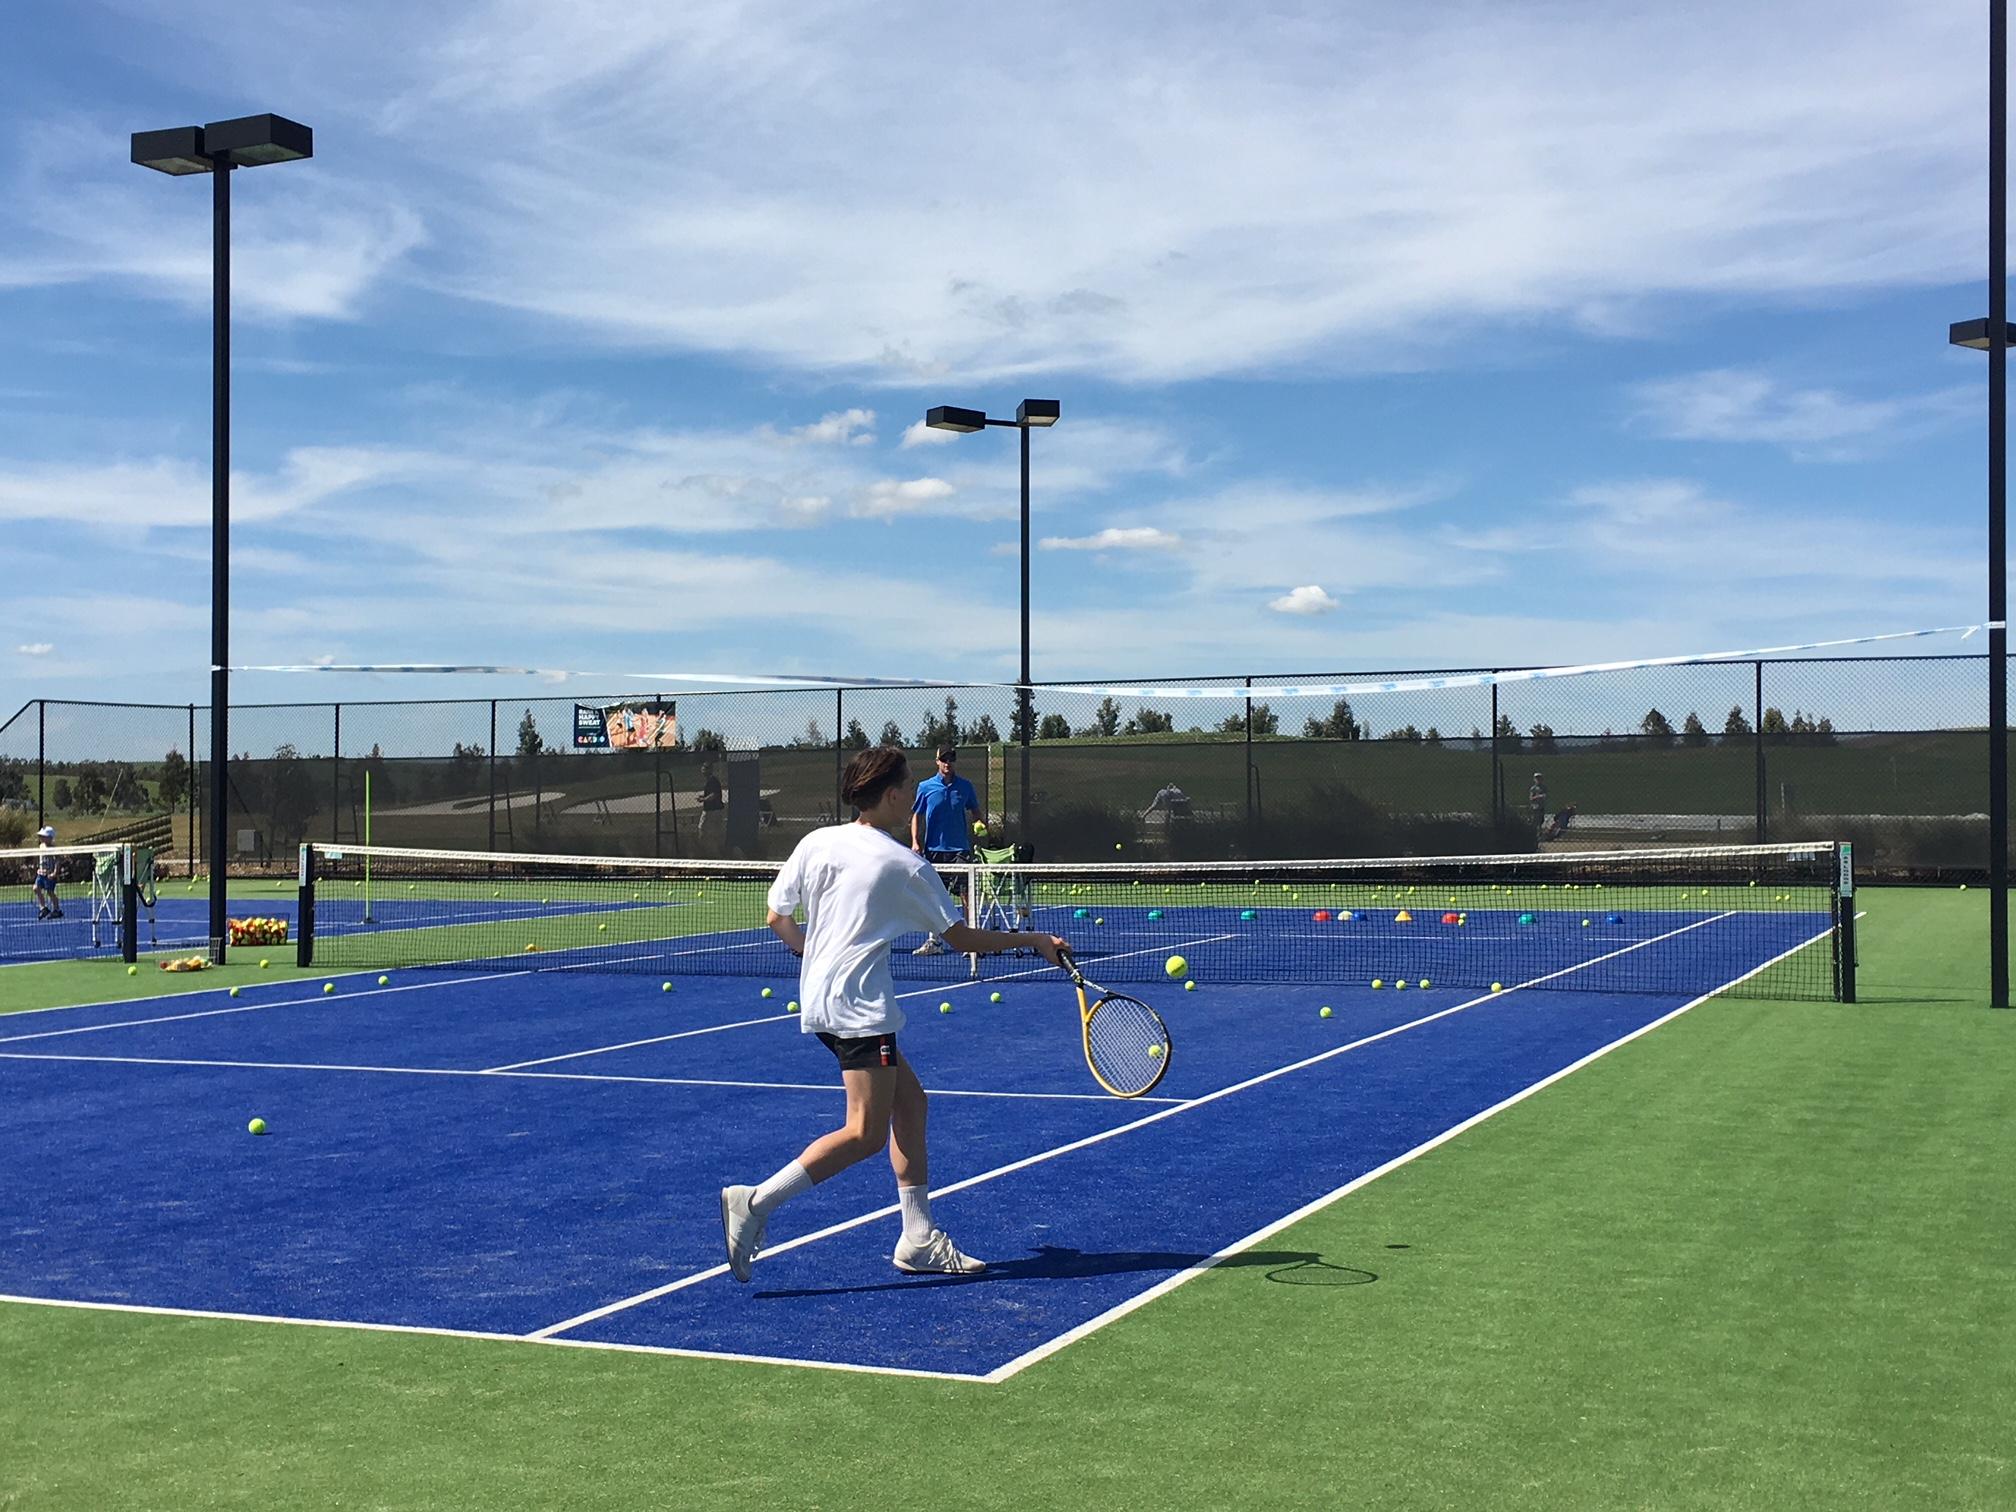 Playing tennis at Eastern Golf Club